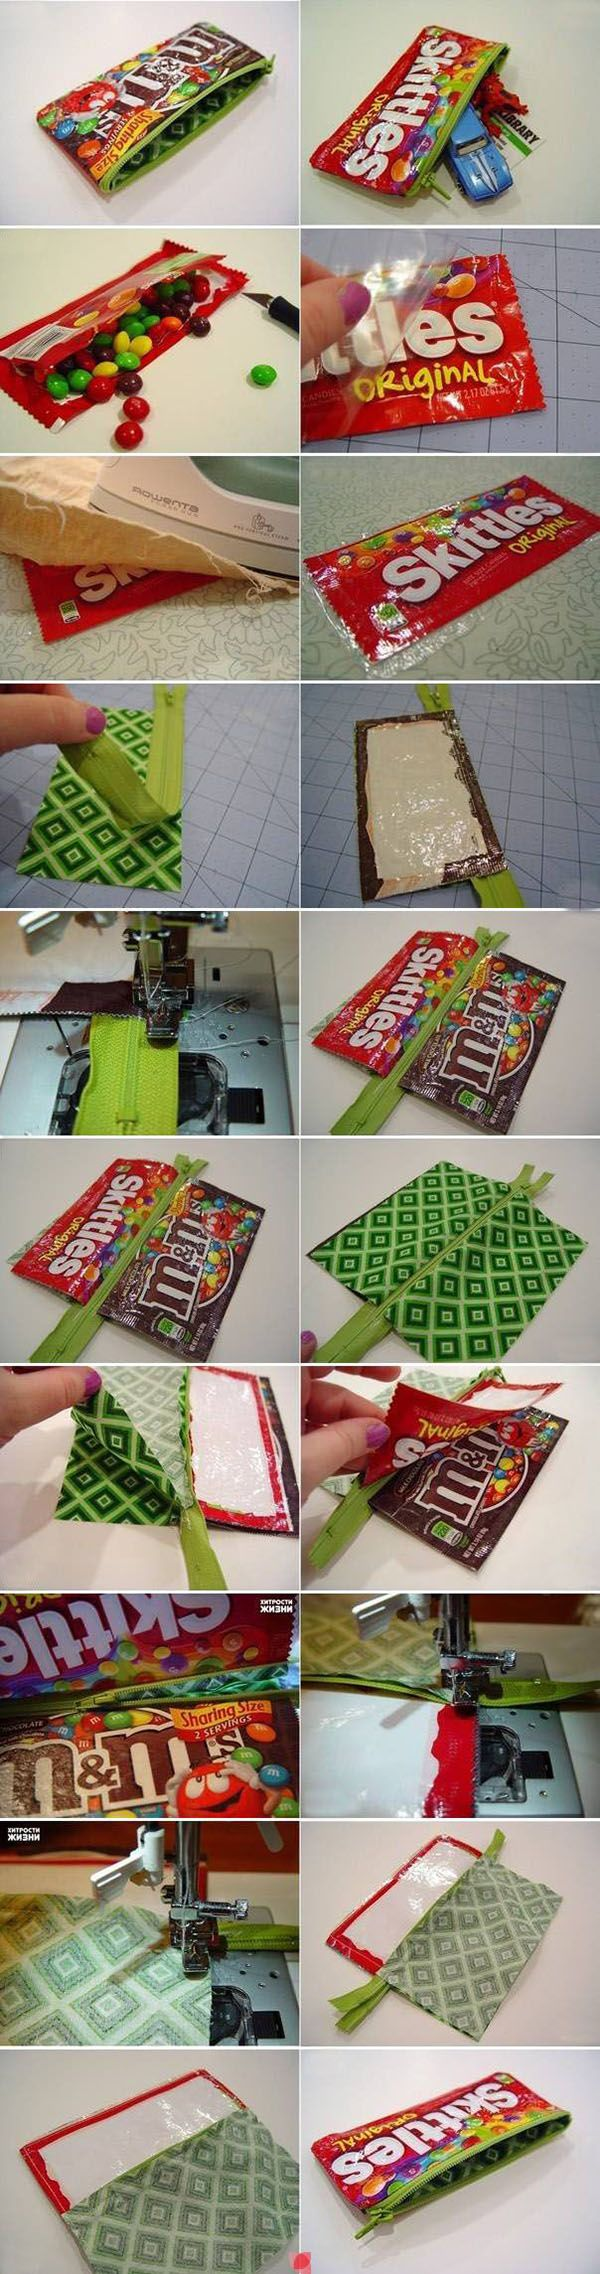 DIY Skittles Wallet....kudos to creativity!